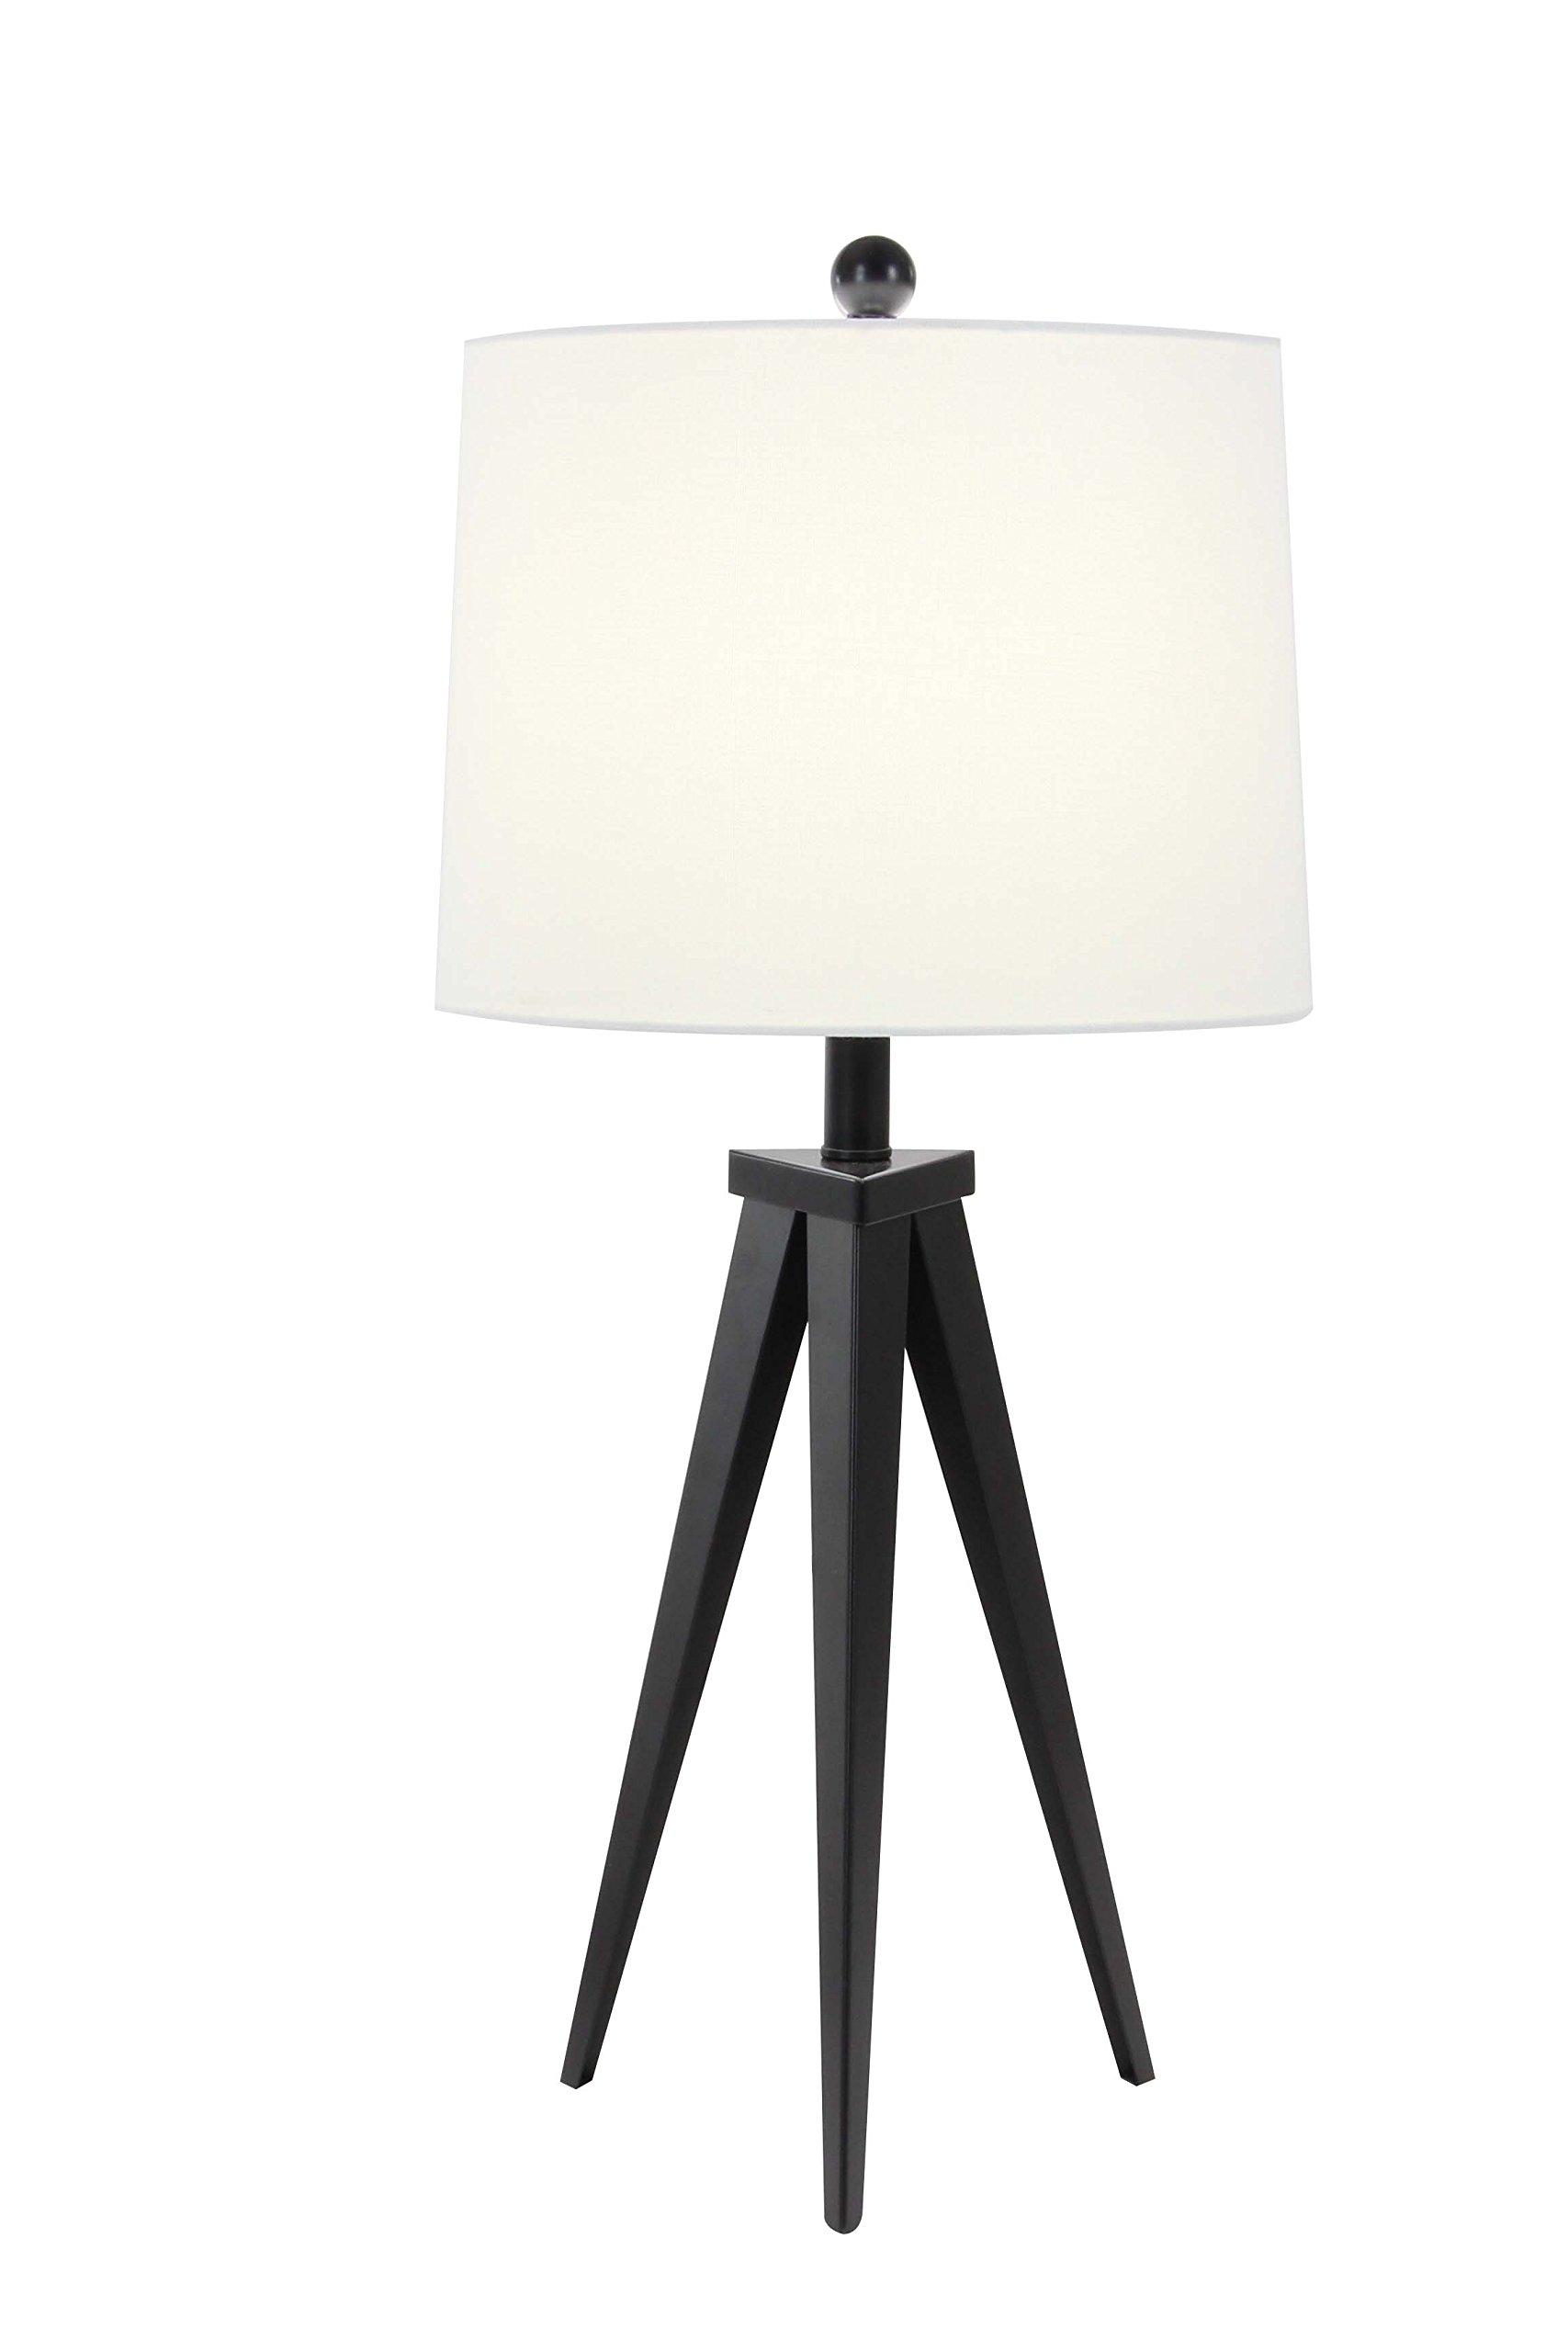 Deco 79 58652 Iron Tripod Table Lamp, White/Black by Deco 79